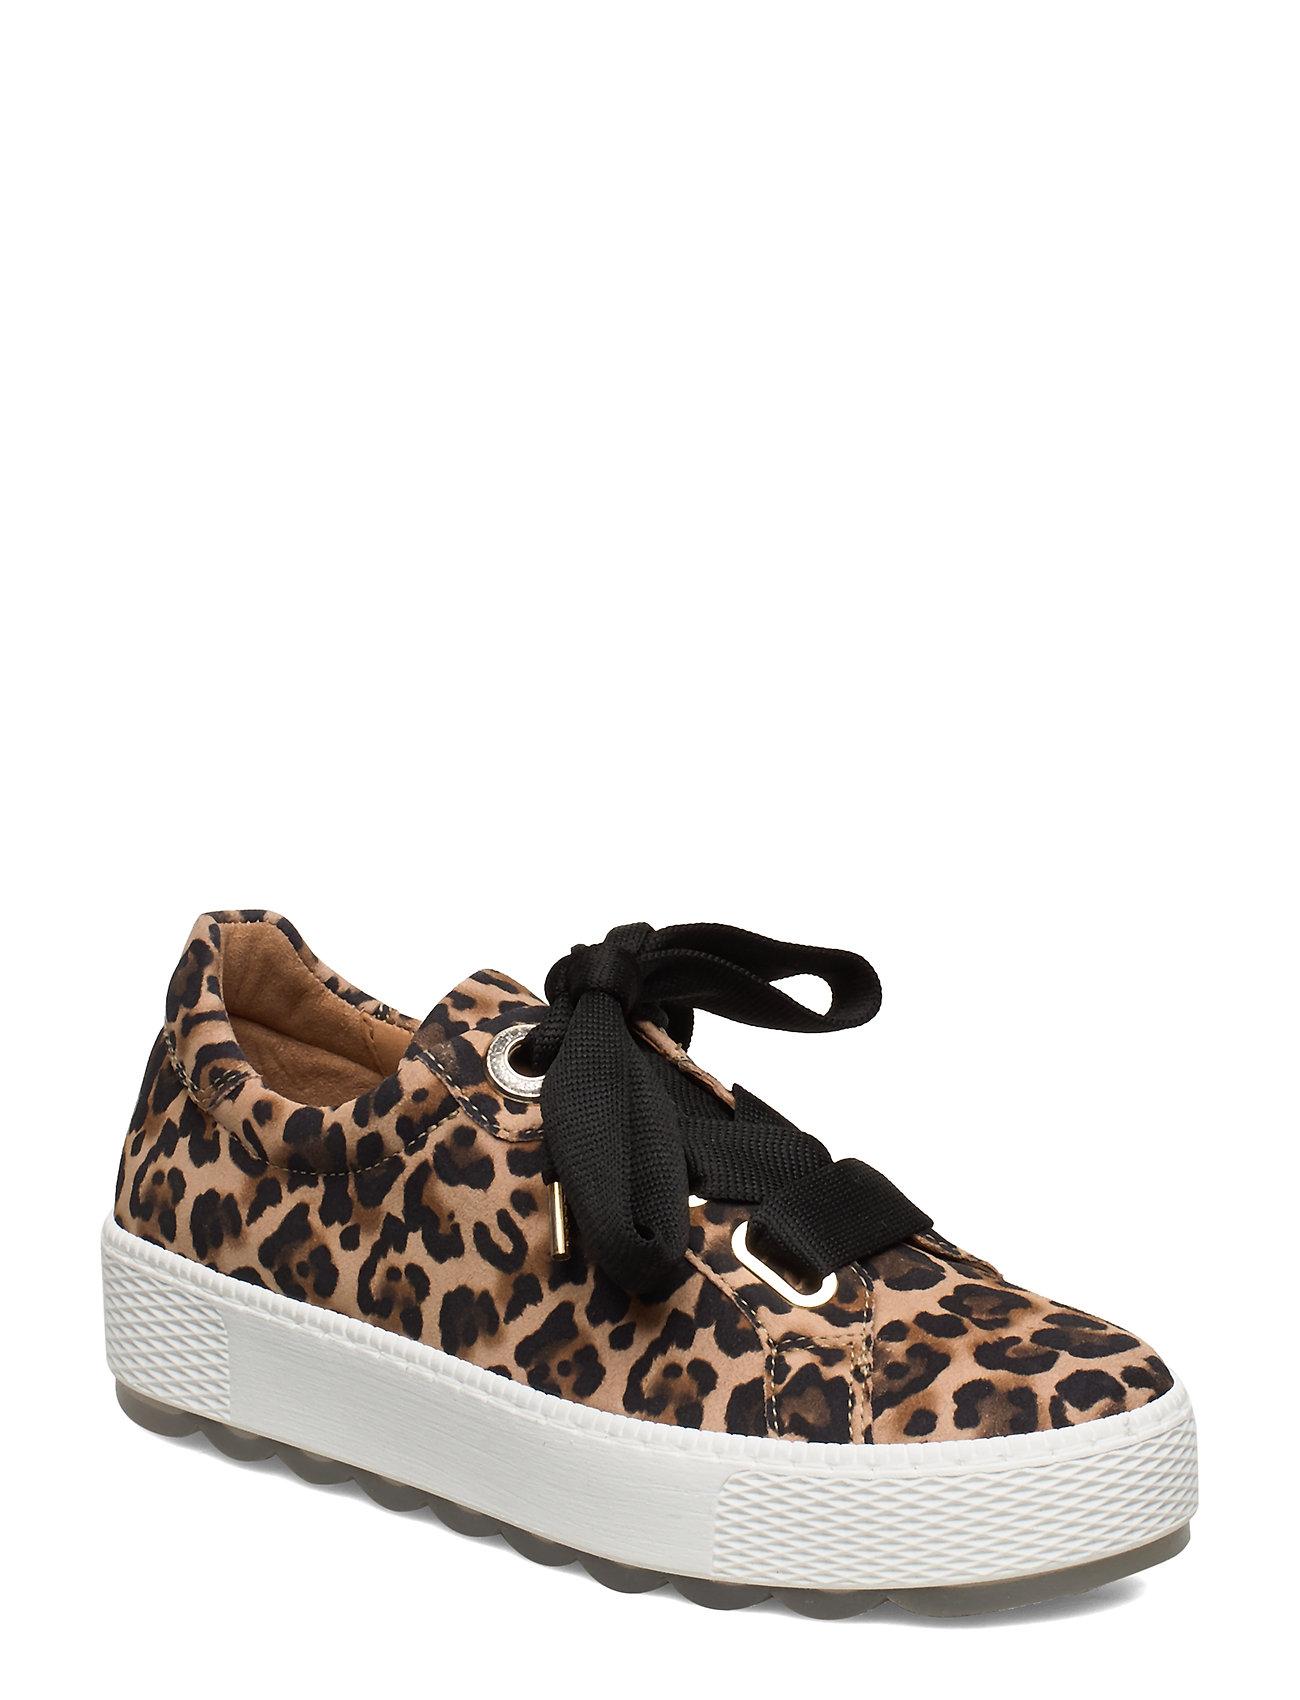 Image of Sneaker Low-top Sneakers Brun Gabor (3356554151)